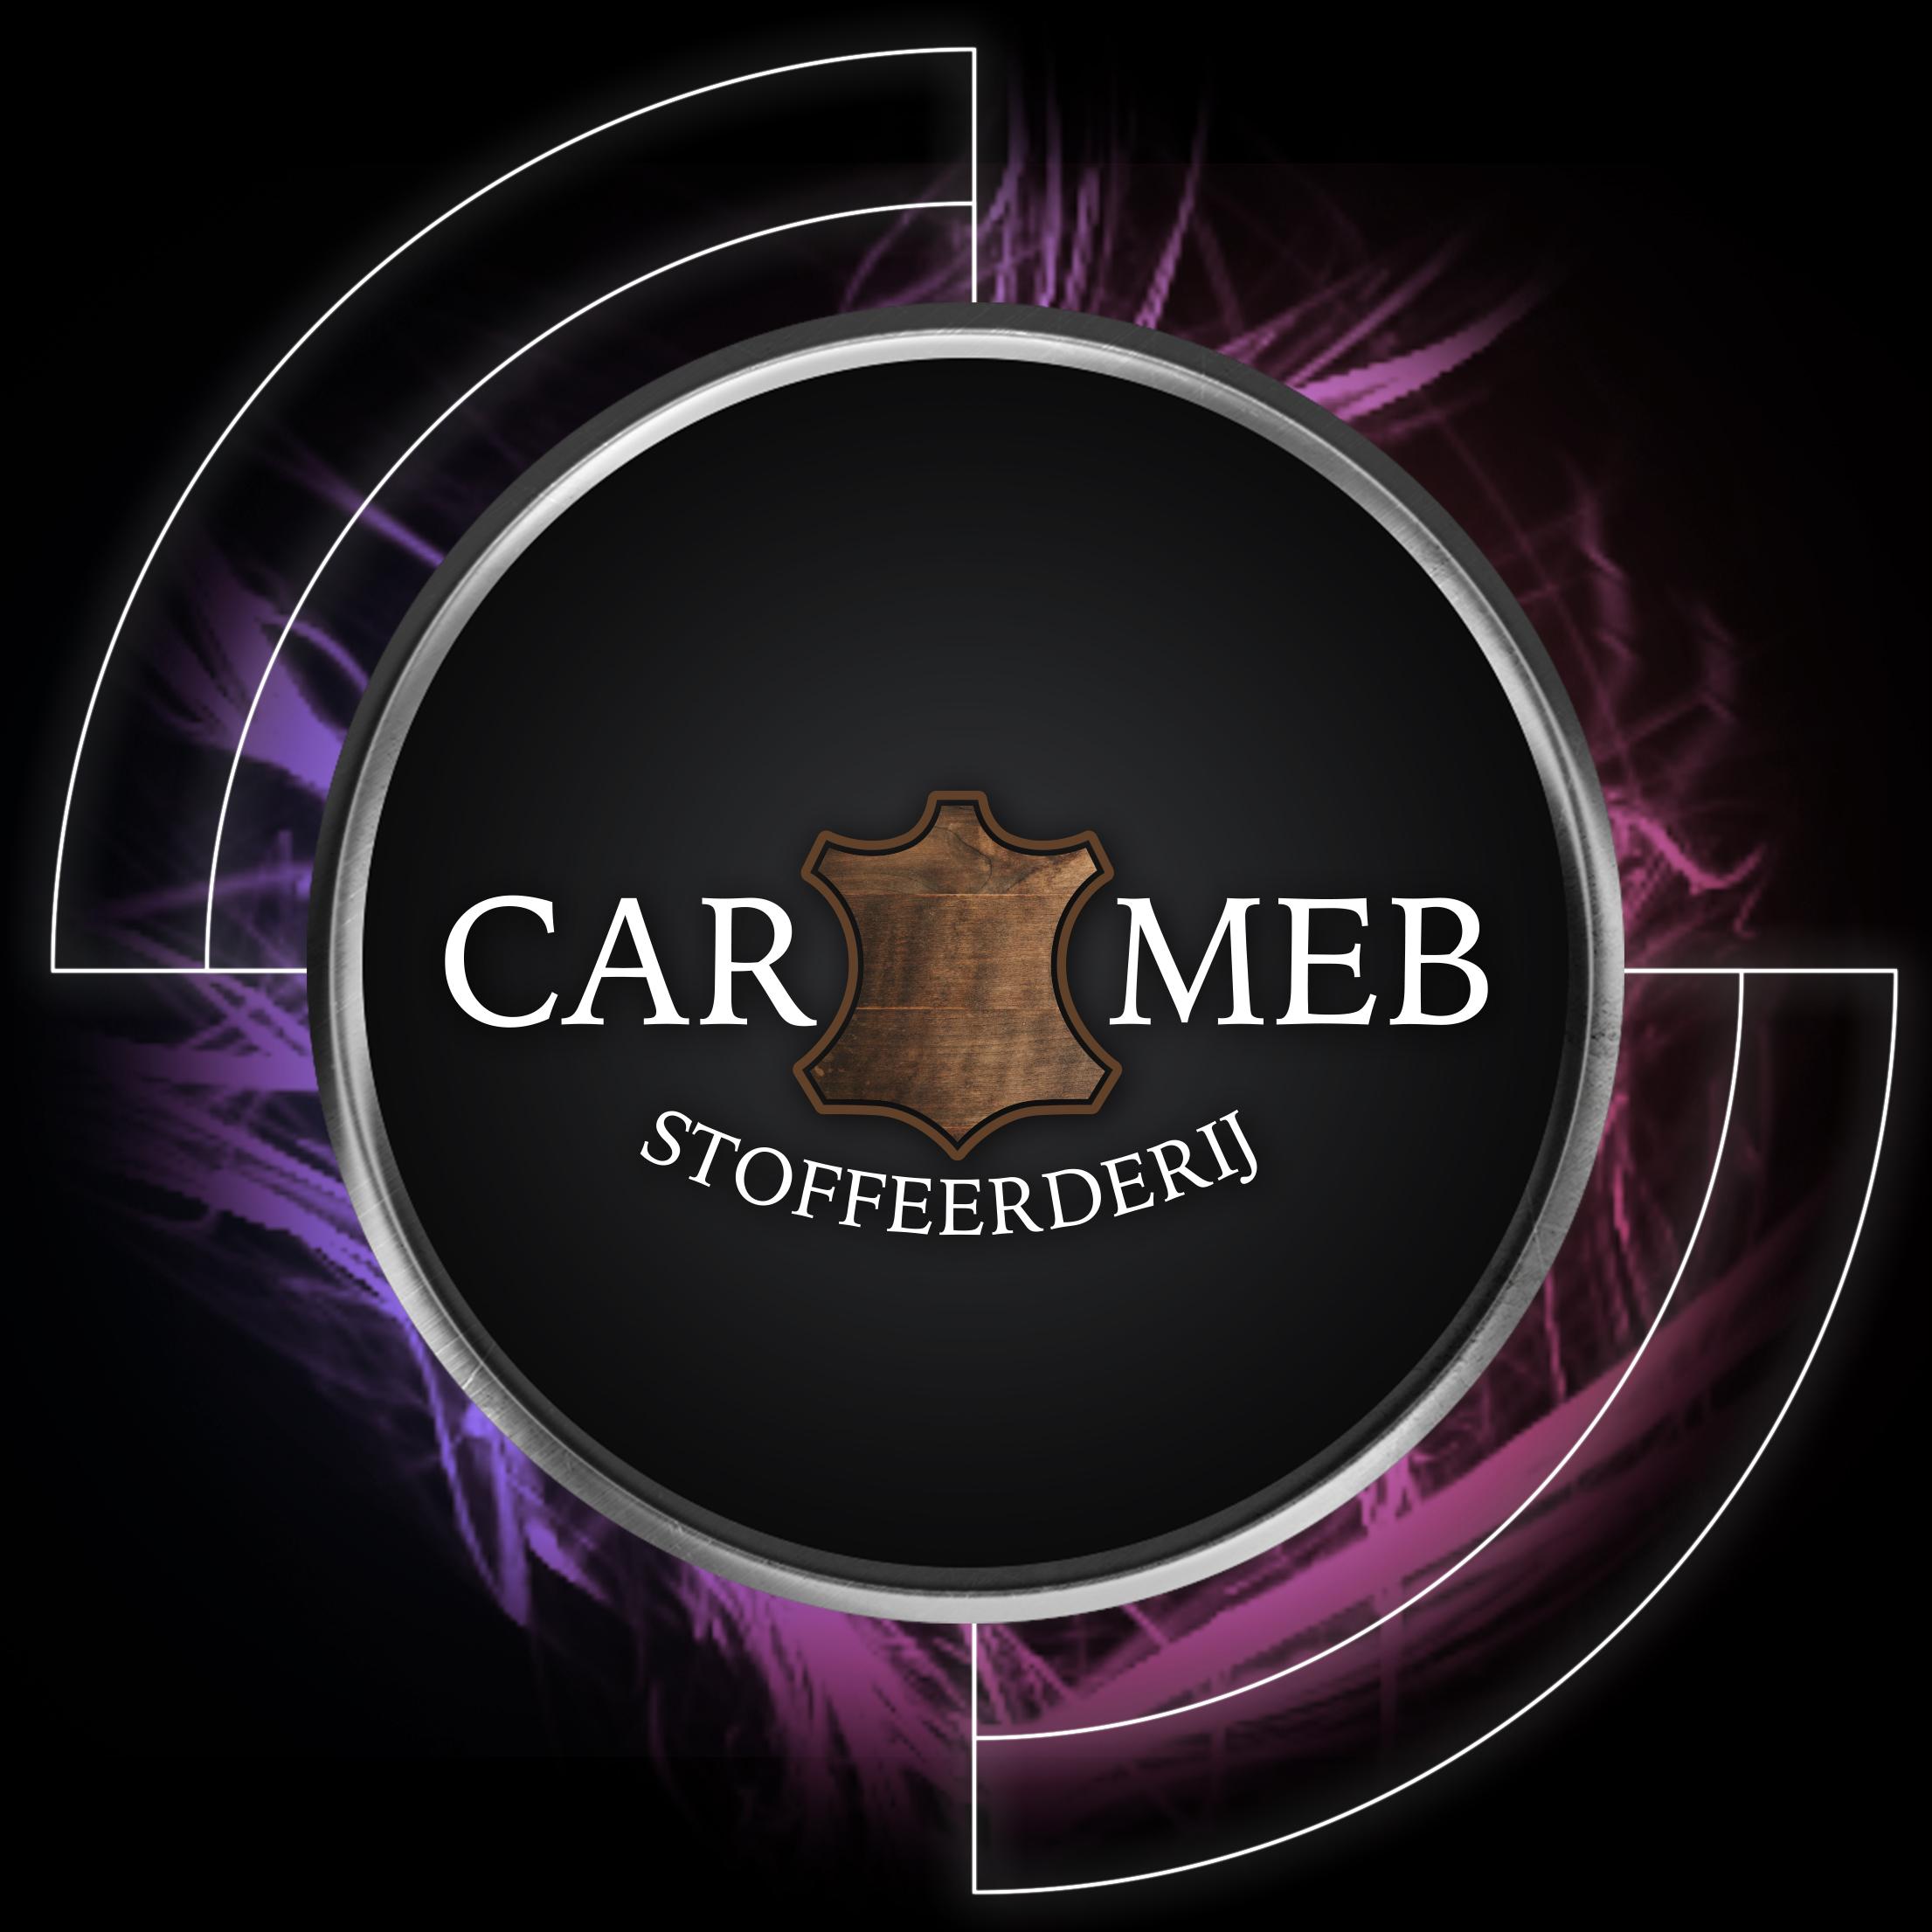 CarMeb